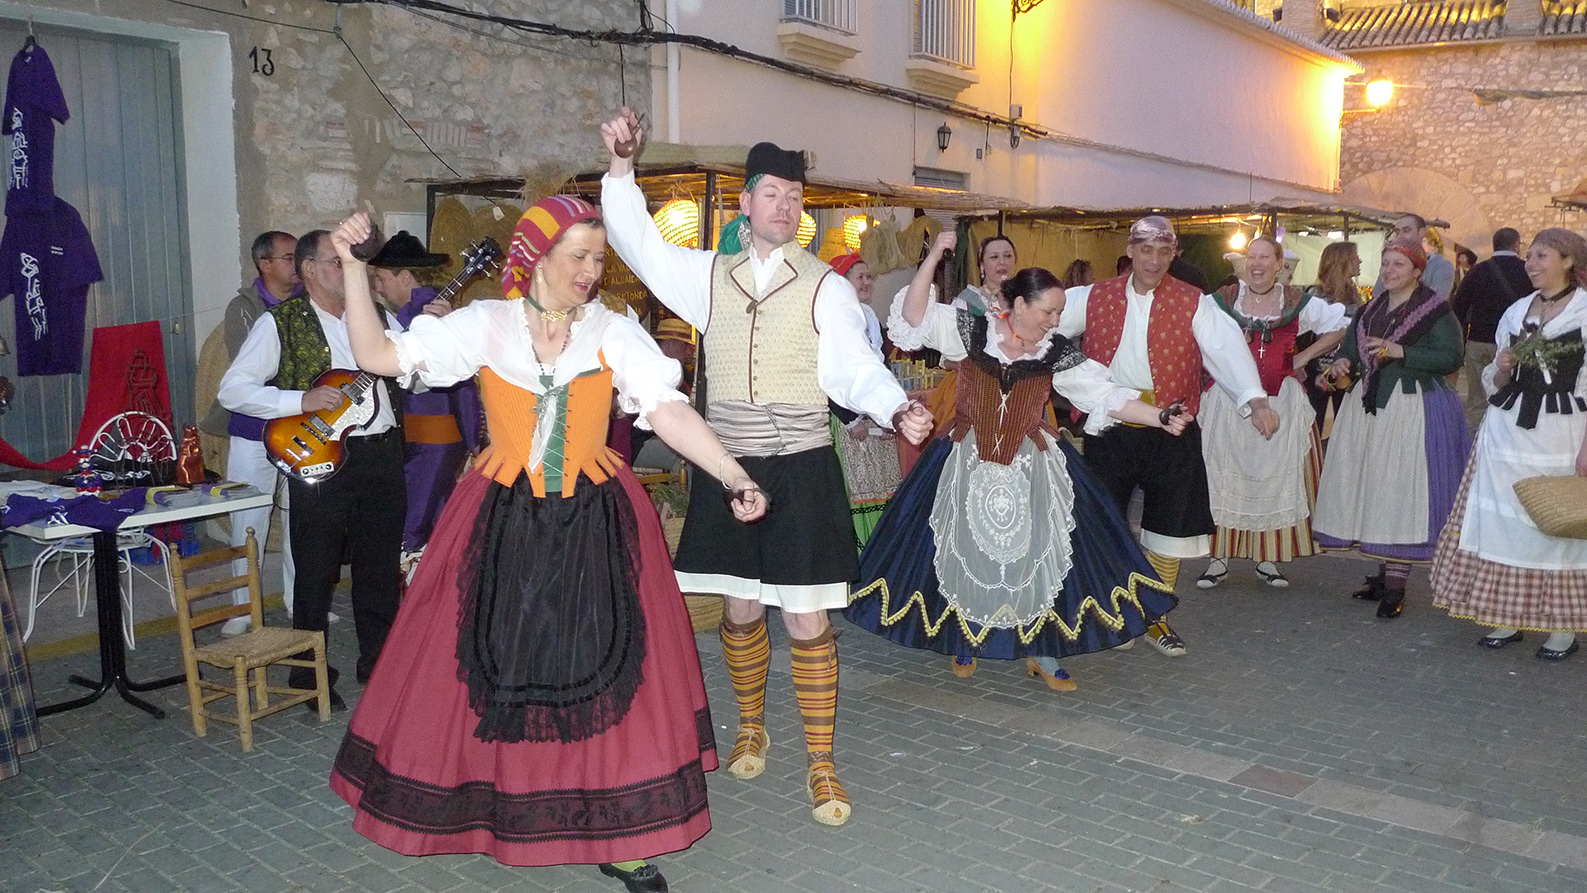 2014-02-23 - Baladre a Fira St. Marcia-ROTOVA (187)